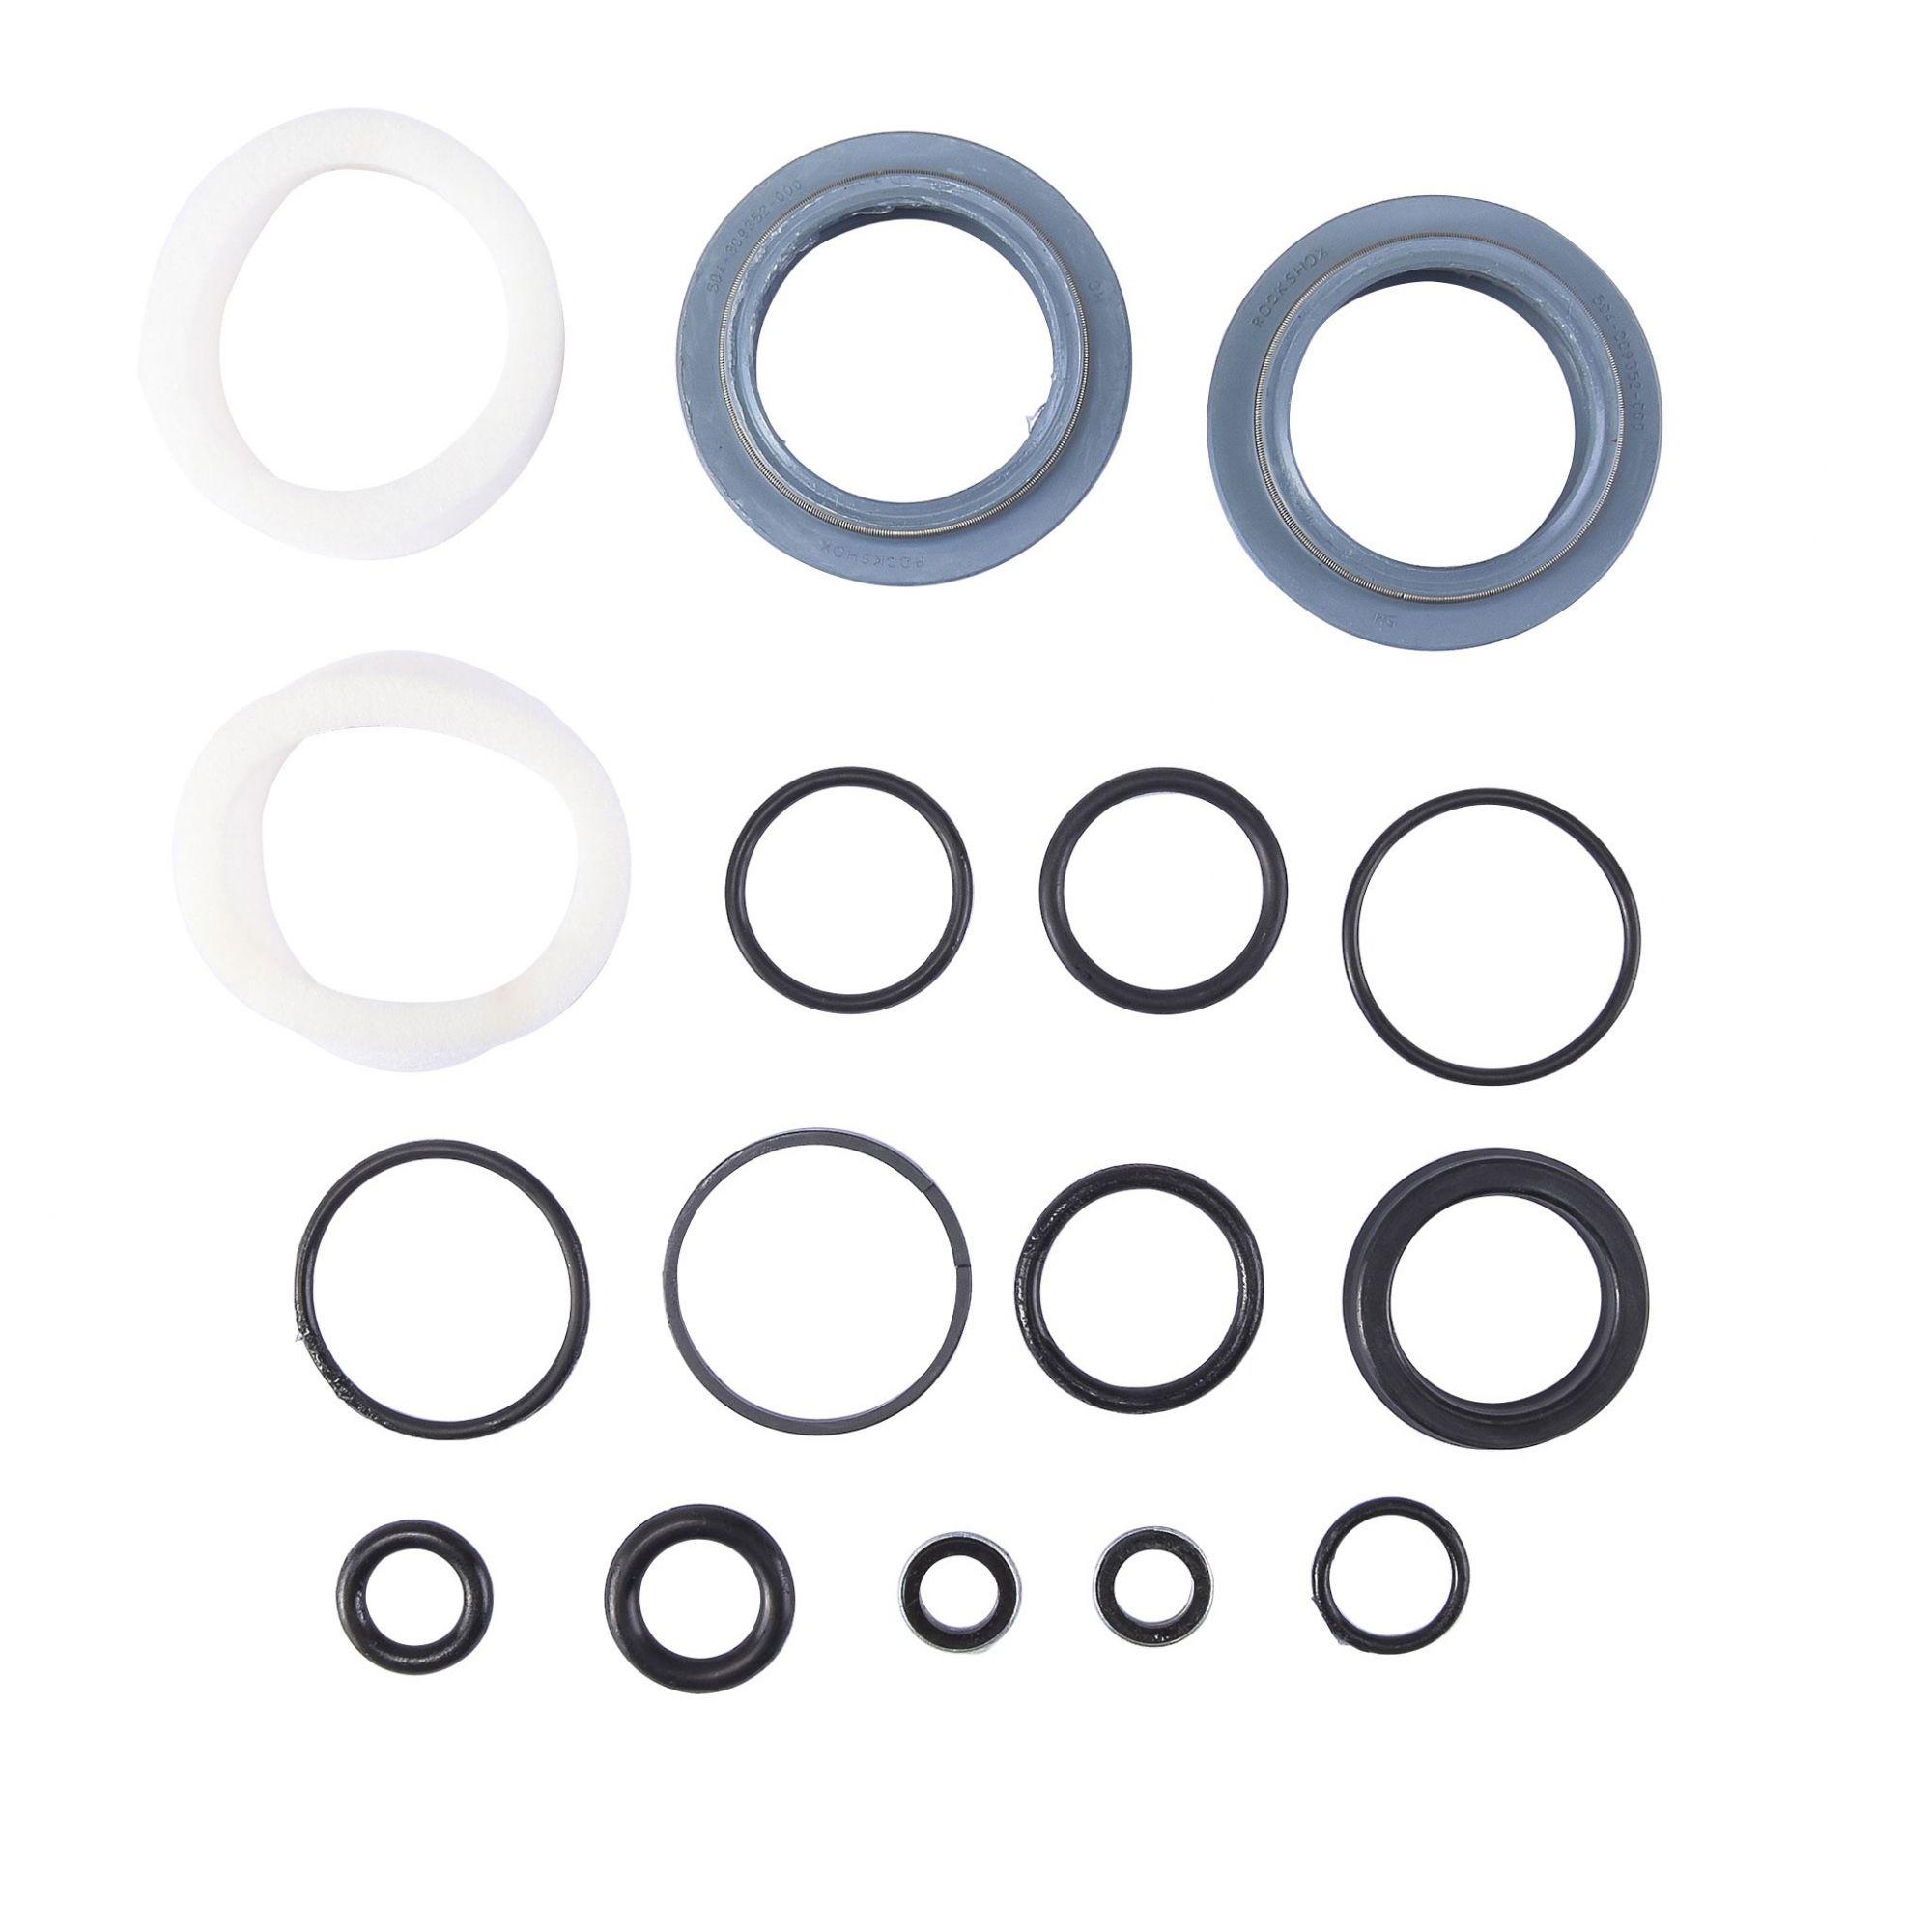 Kit Reparo Retentores Rockshox Recon Silver Solo Air 00.4315.032.020